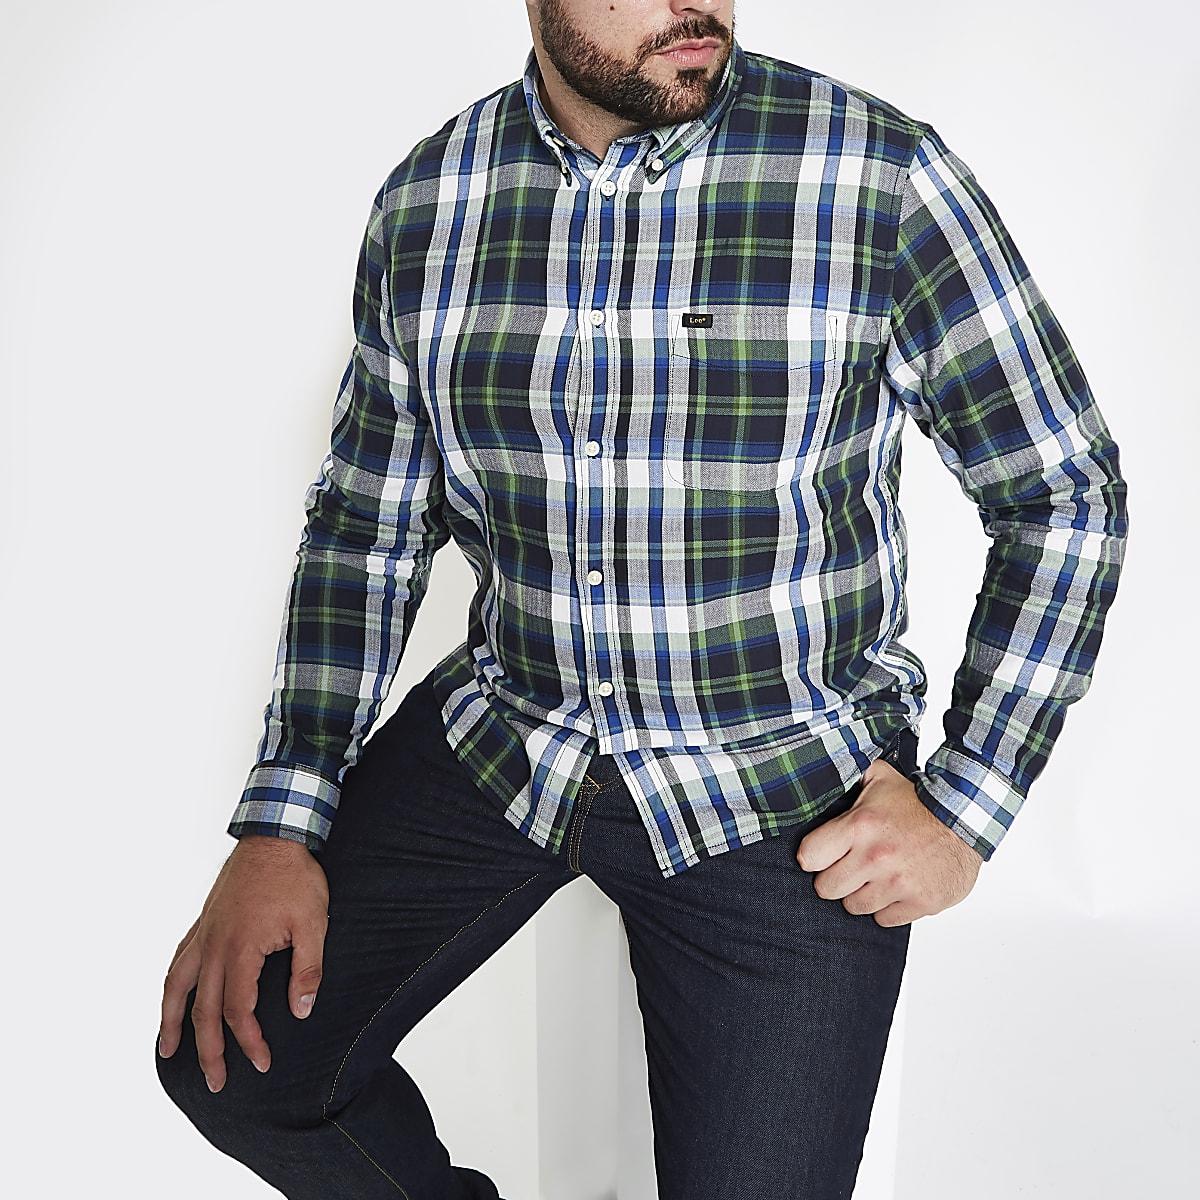 Groen Geruit Overhemd.Lee Big And Tall Groene Geruit Overhemd Overhemden Met Lange